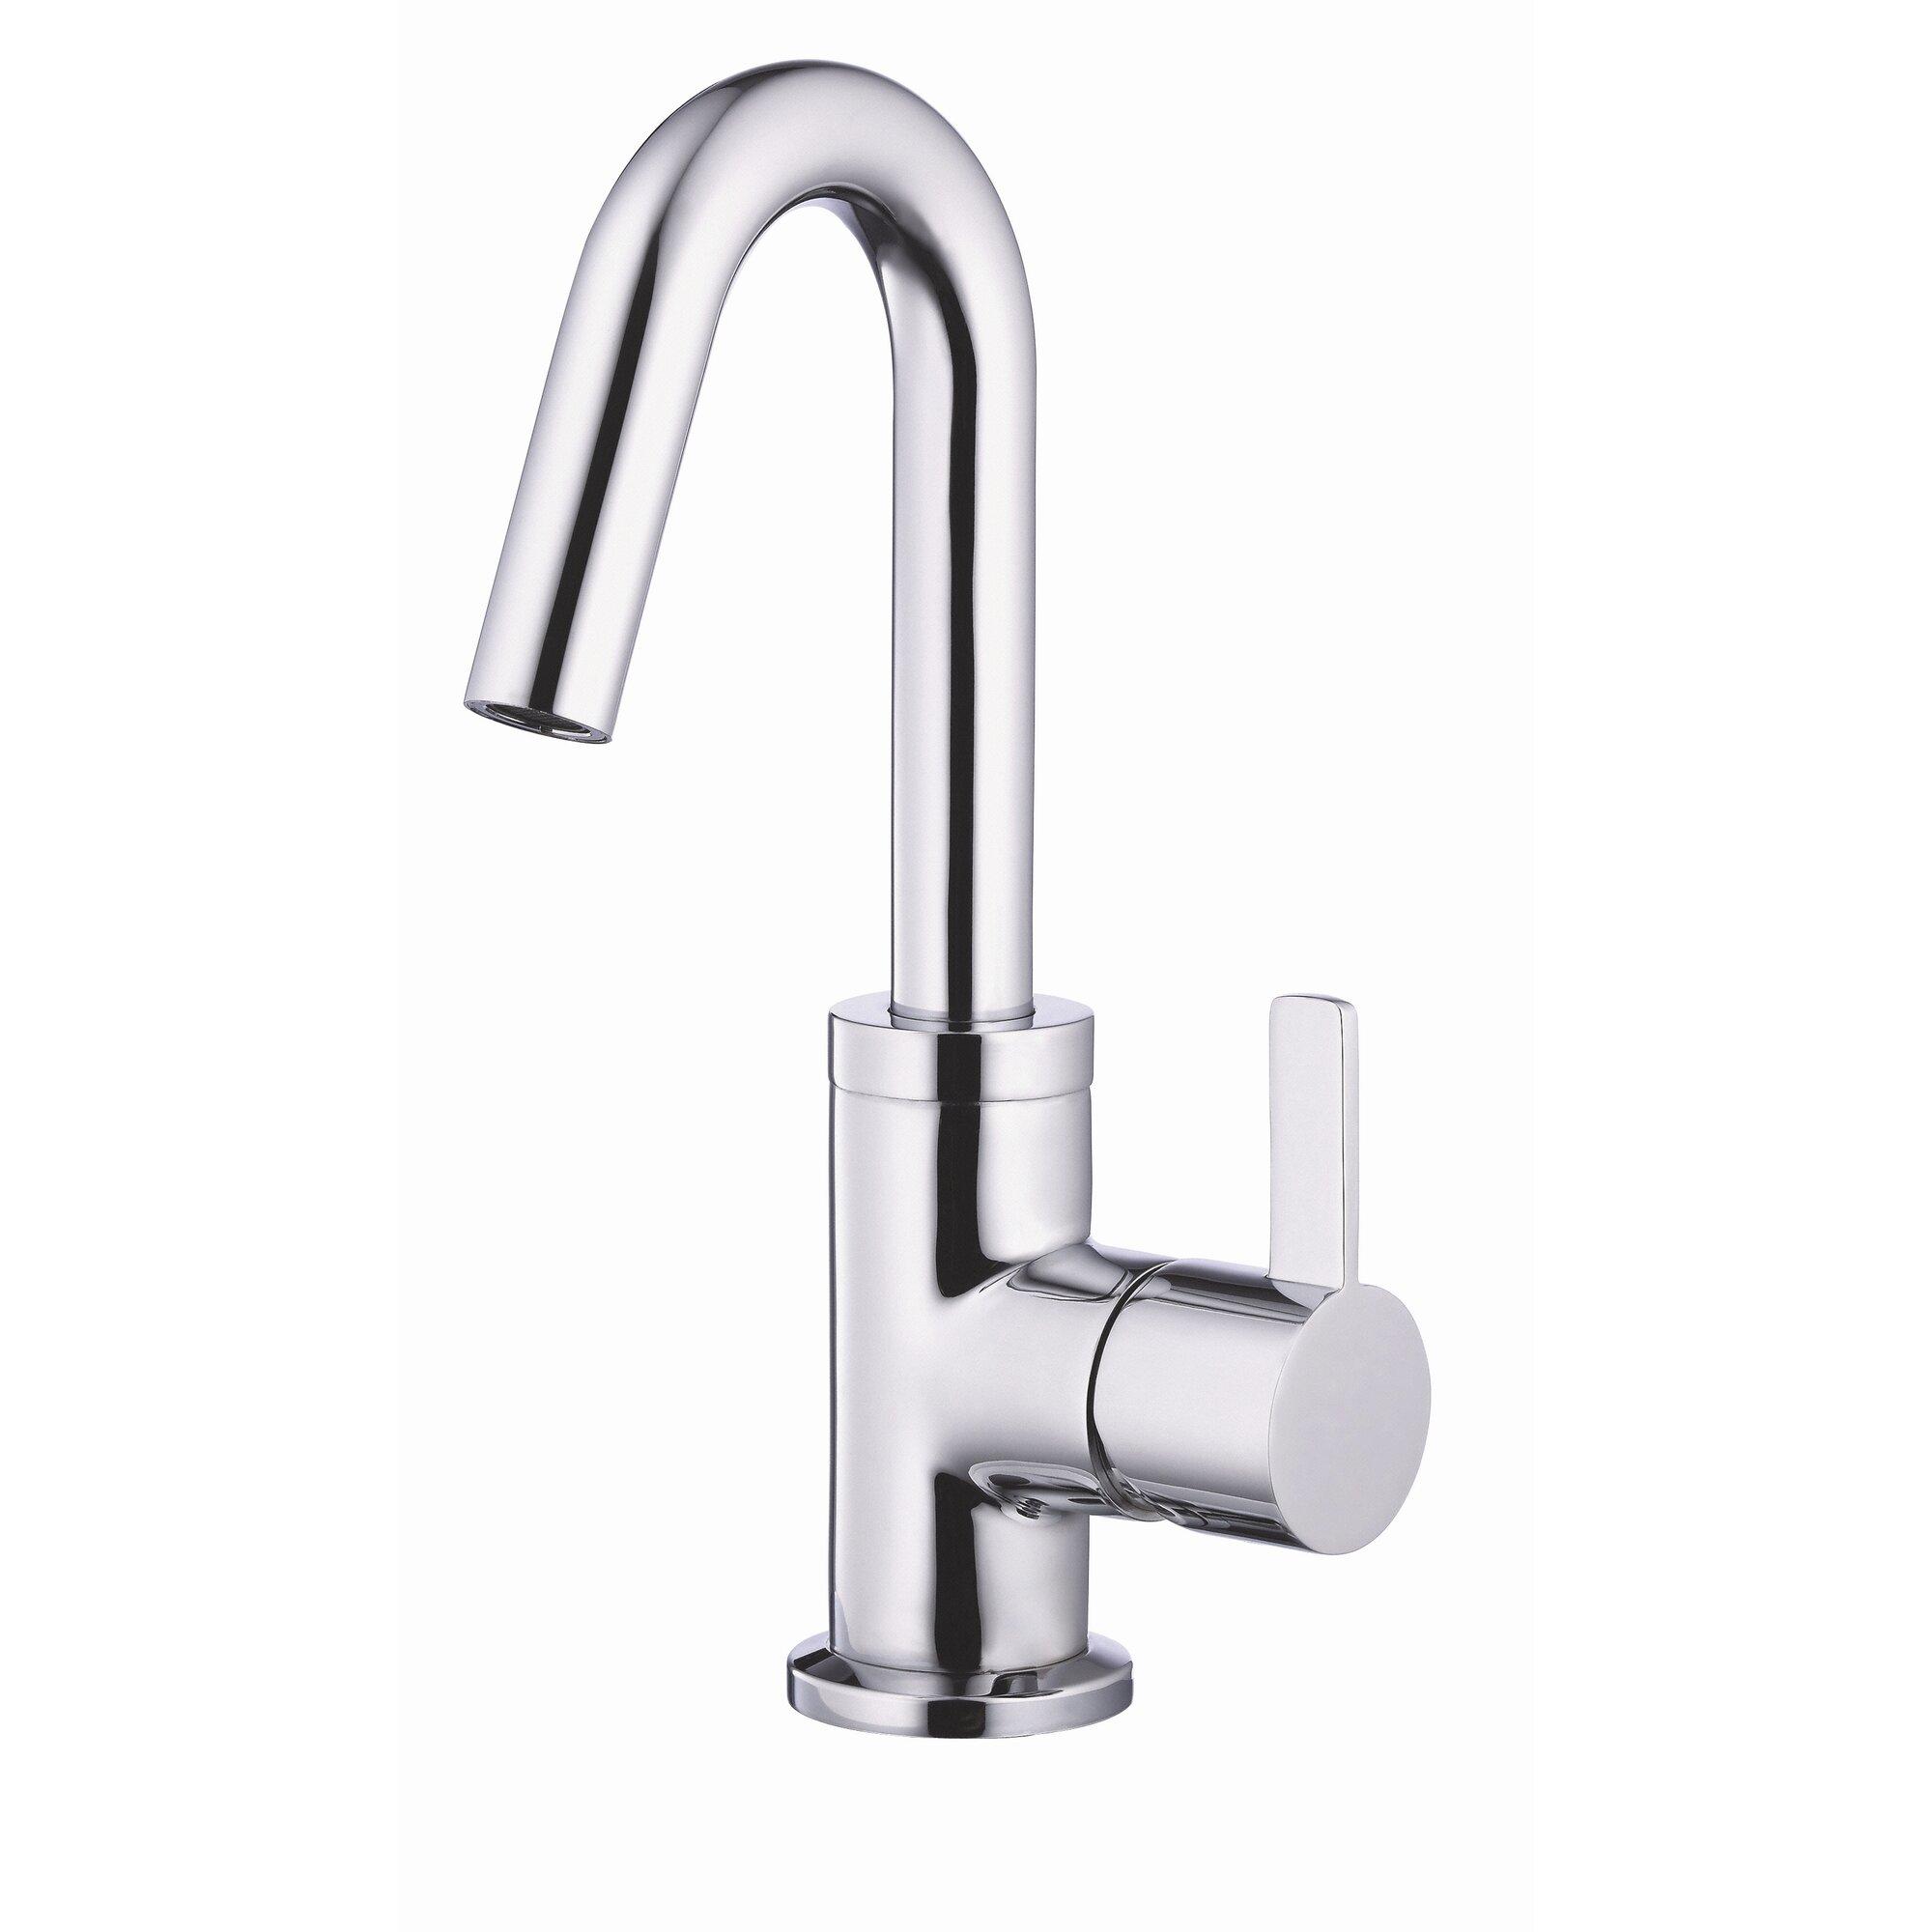 Cross Handle Bathroom Faucet Danze Amalfi Single Handle Single Hole Bathroom Faucet Reviews